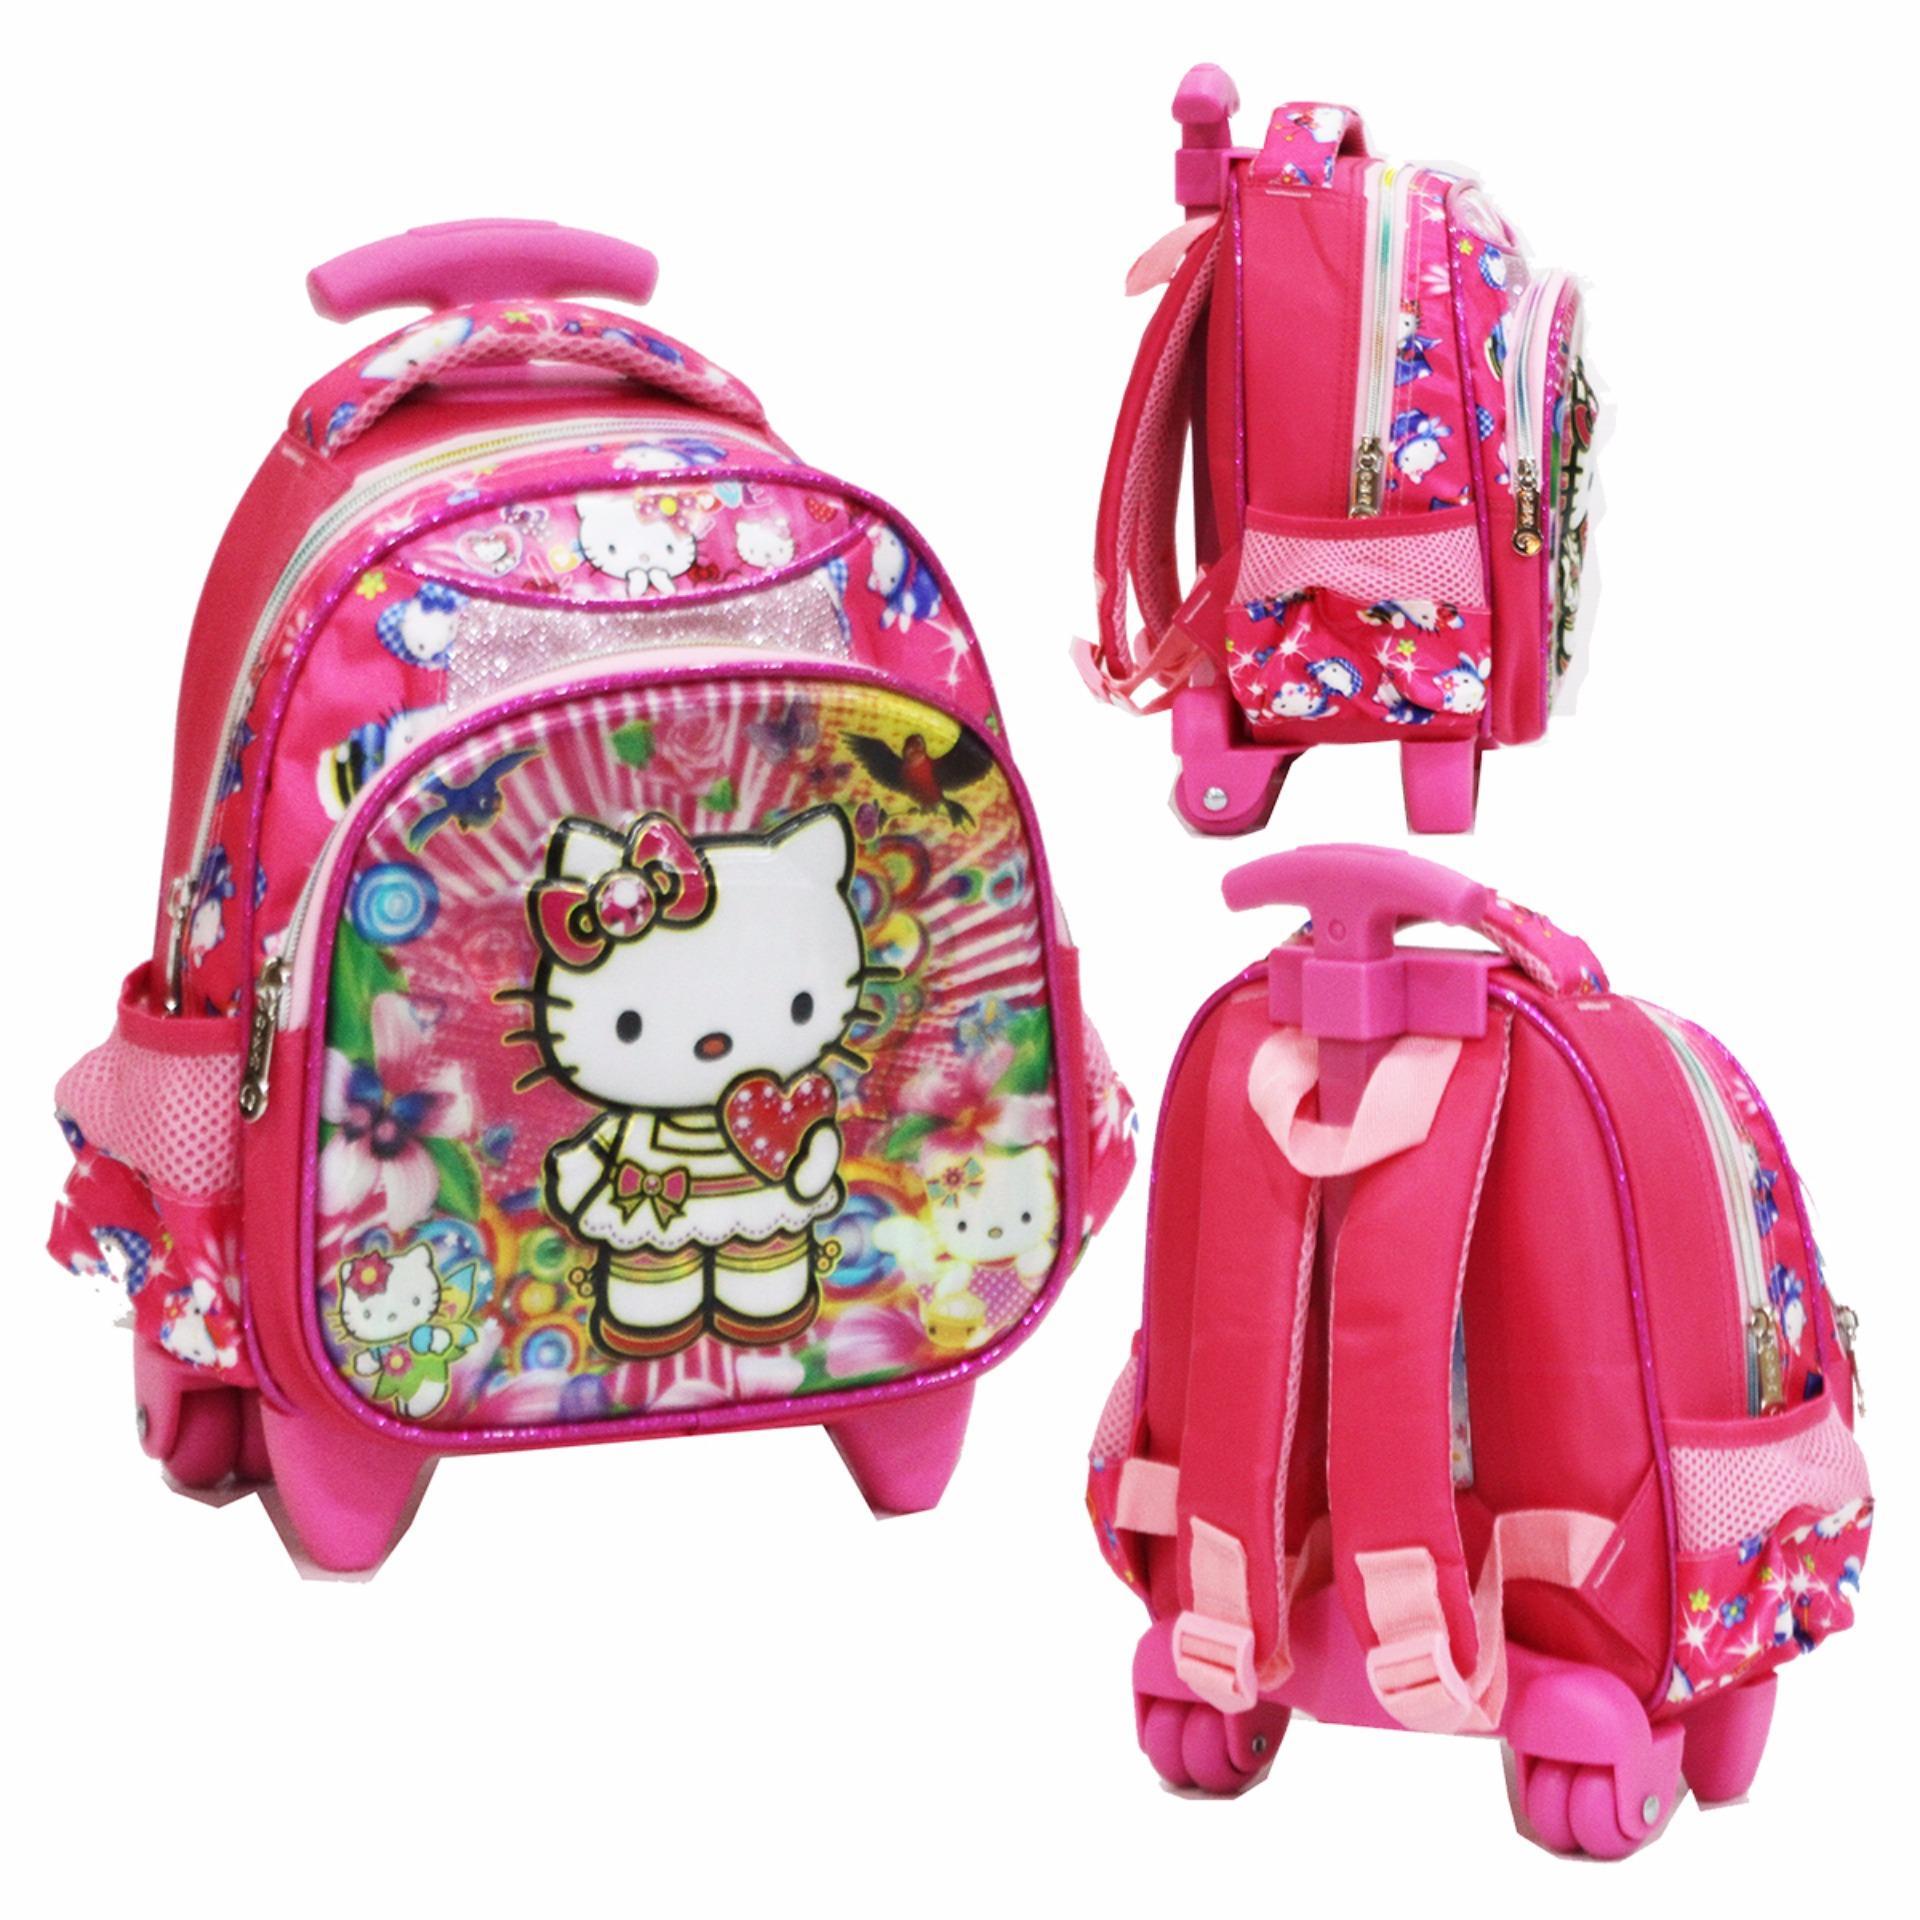 Onlan Tas Trolley Anak Sekolah Paut Karakter Hello Kitty Cantik 5D Timbul Hologram